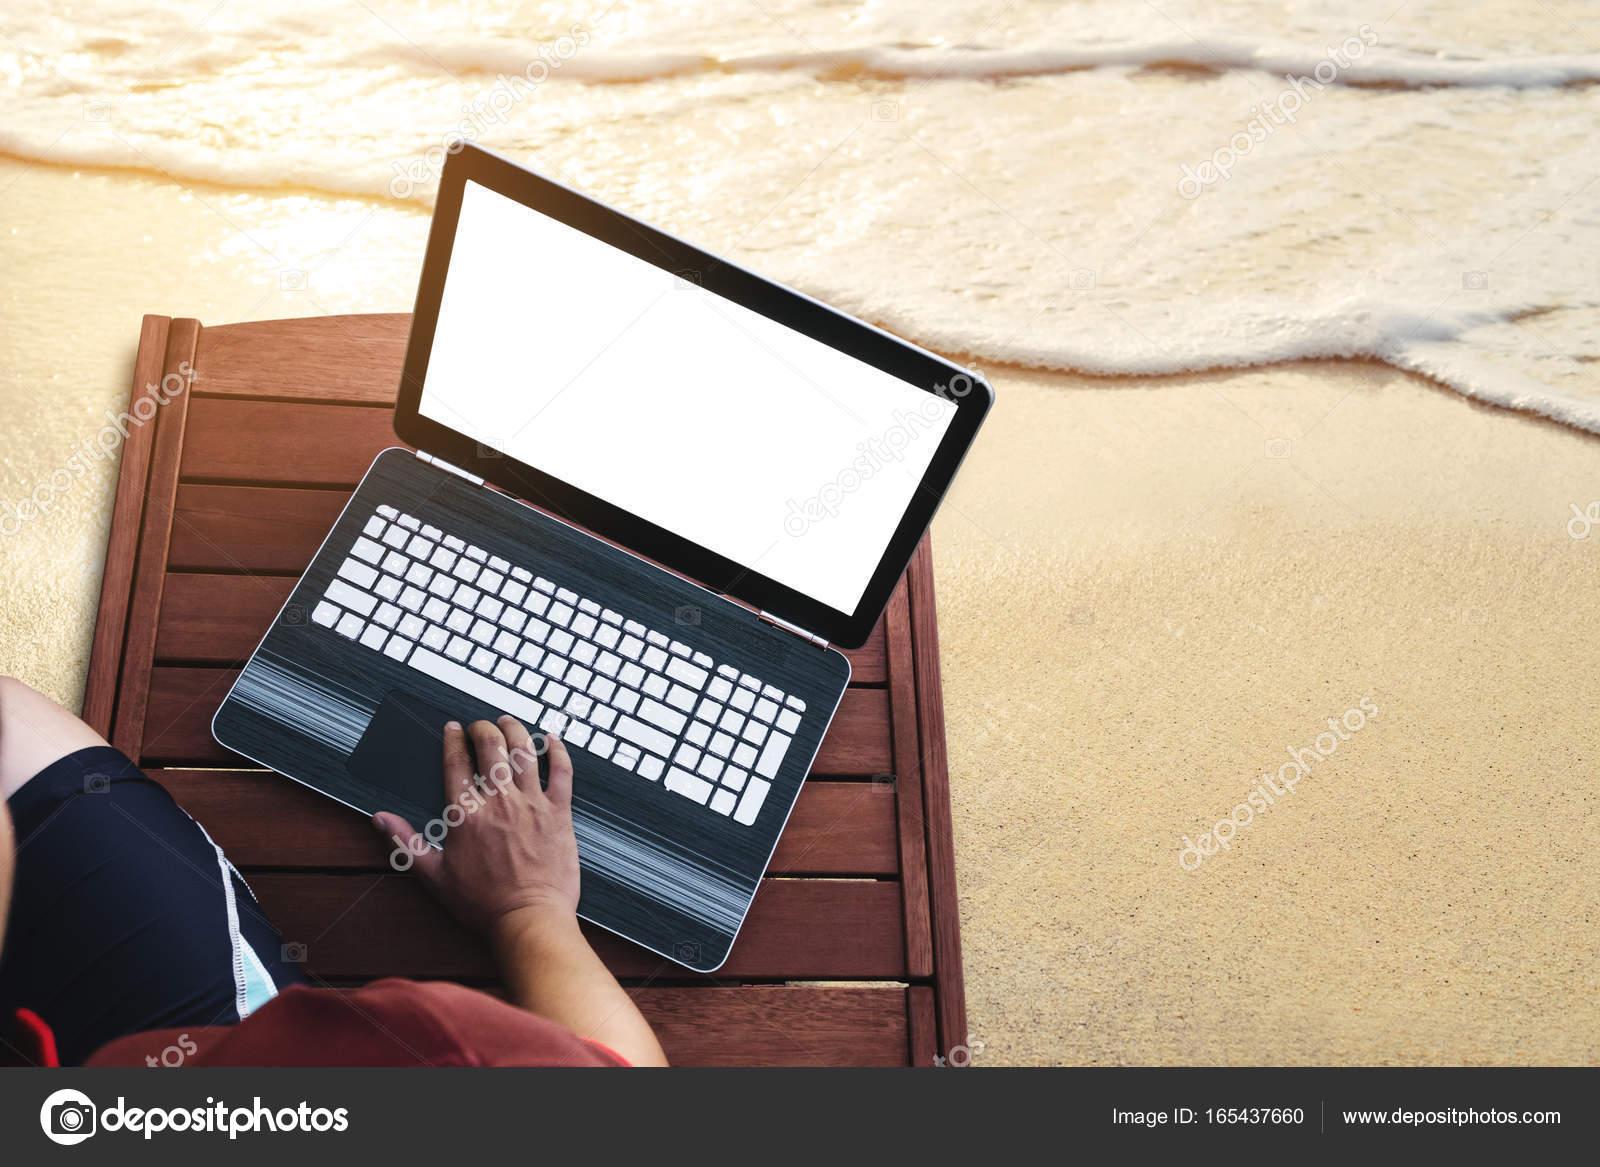 Strange A Man Using Computer Laptop On Wooden Sunbath Lounge Chair Andrewgaddart Wooden Chair Designs For Living Room Andrewgaddartcom